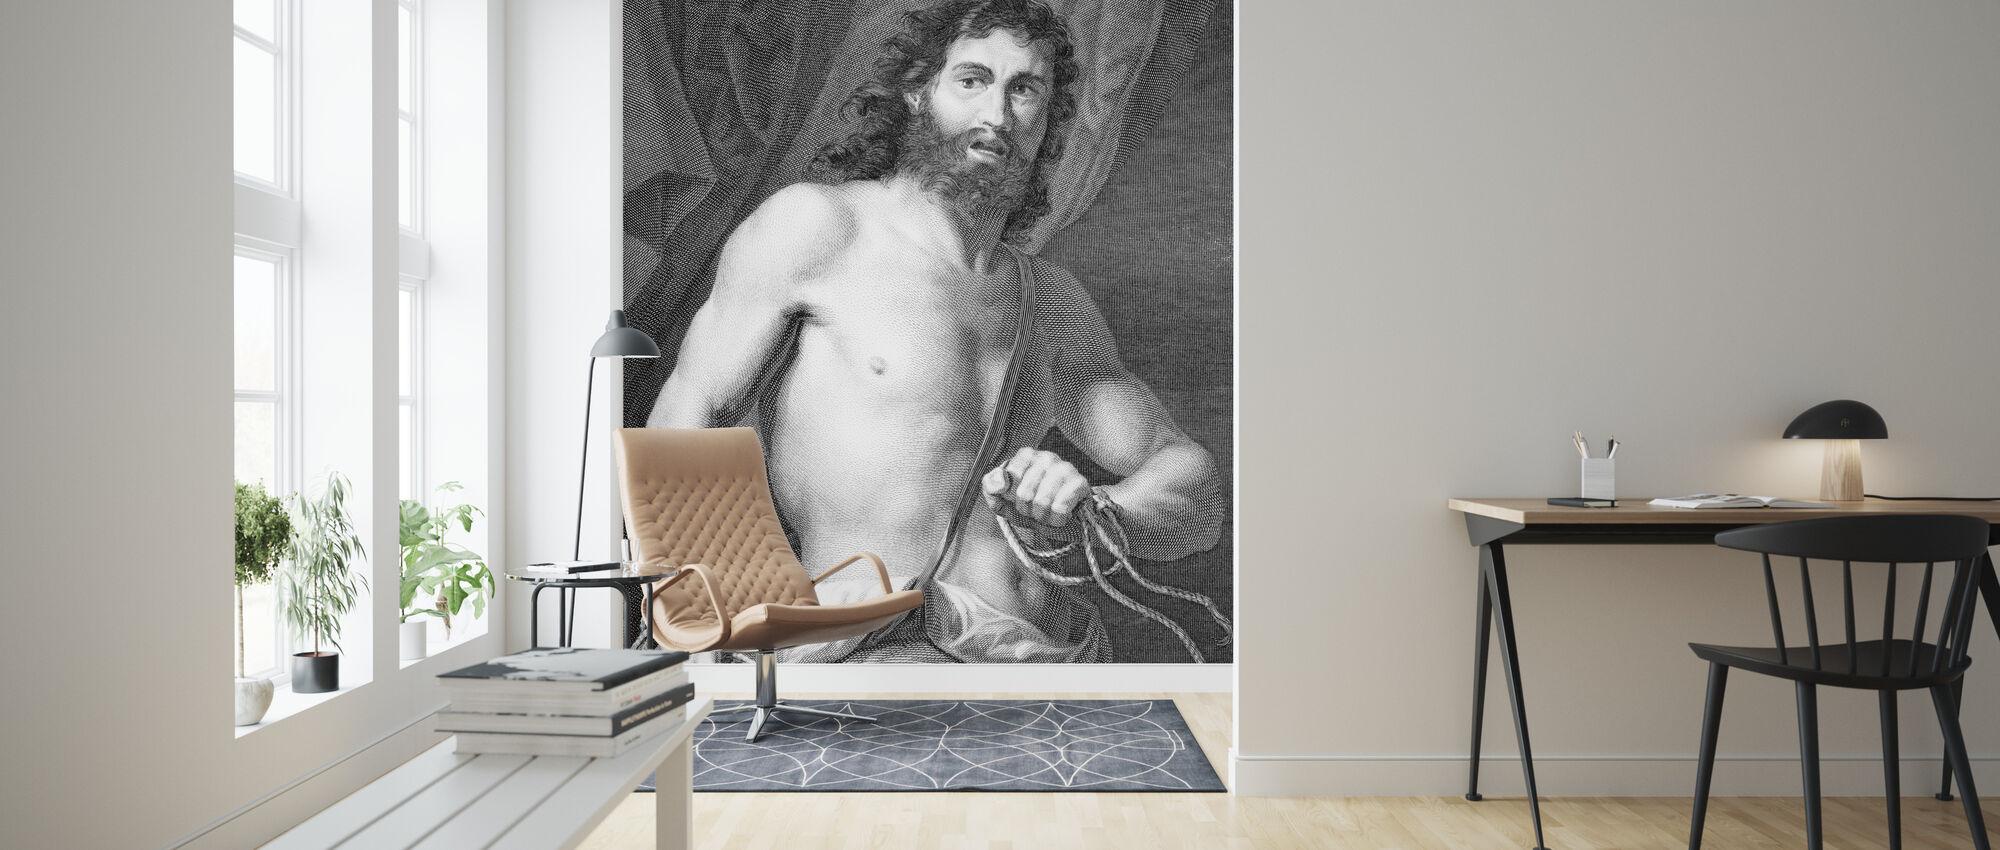 Biblical Hero Samson - Wallpaper - Living Room